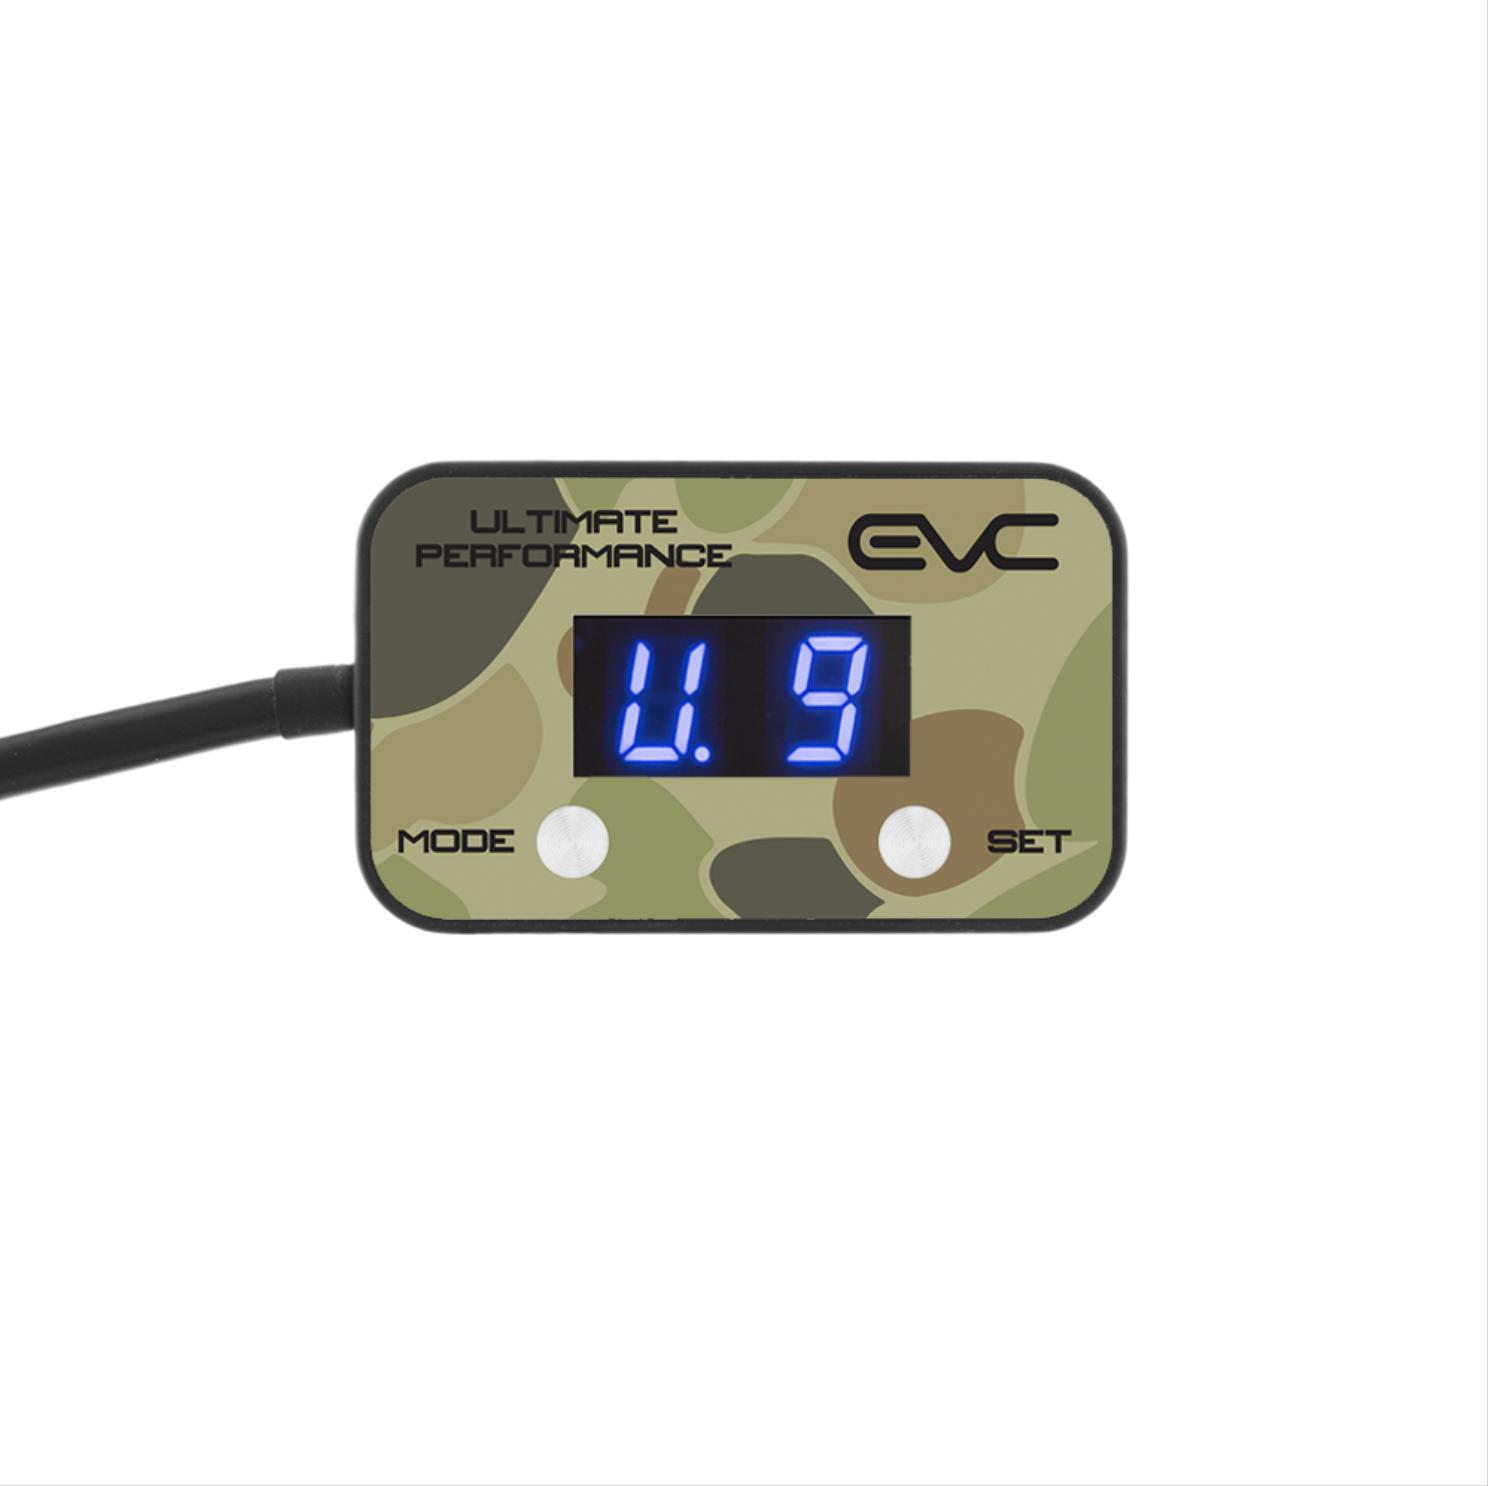 EVC iDrive Throttle Controller Aus Camo for Subaru Outback 2004-2007 EVC501